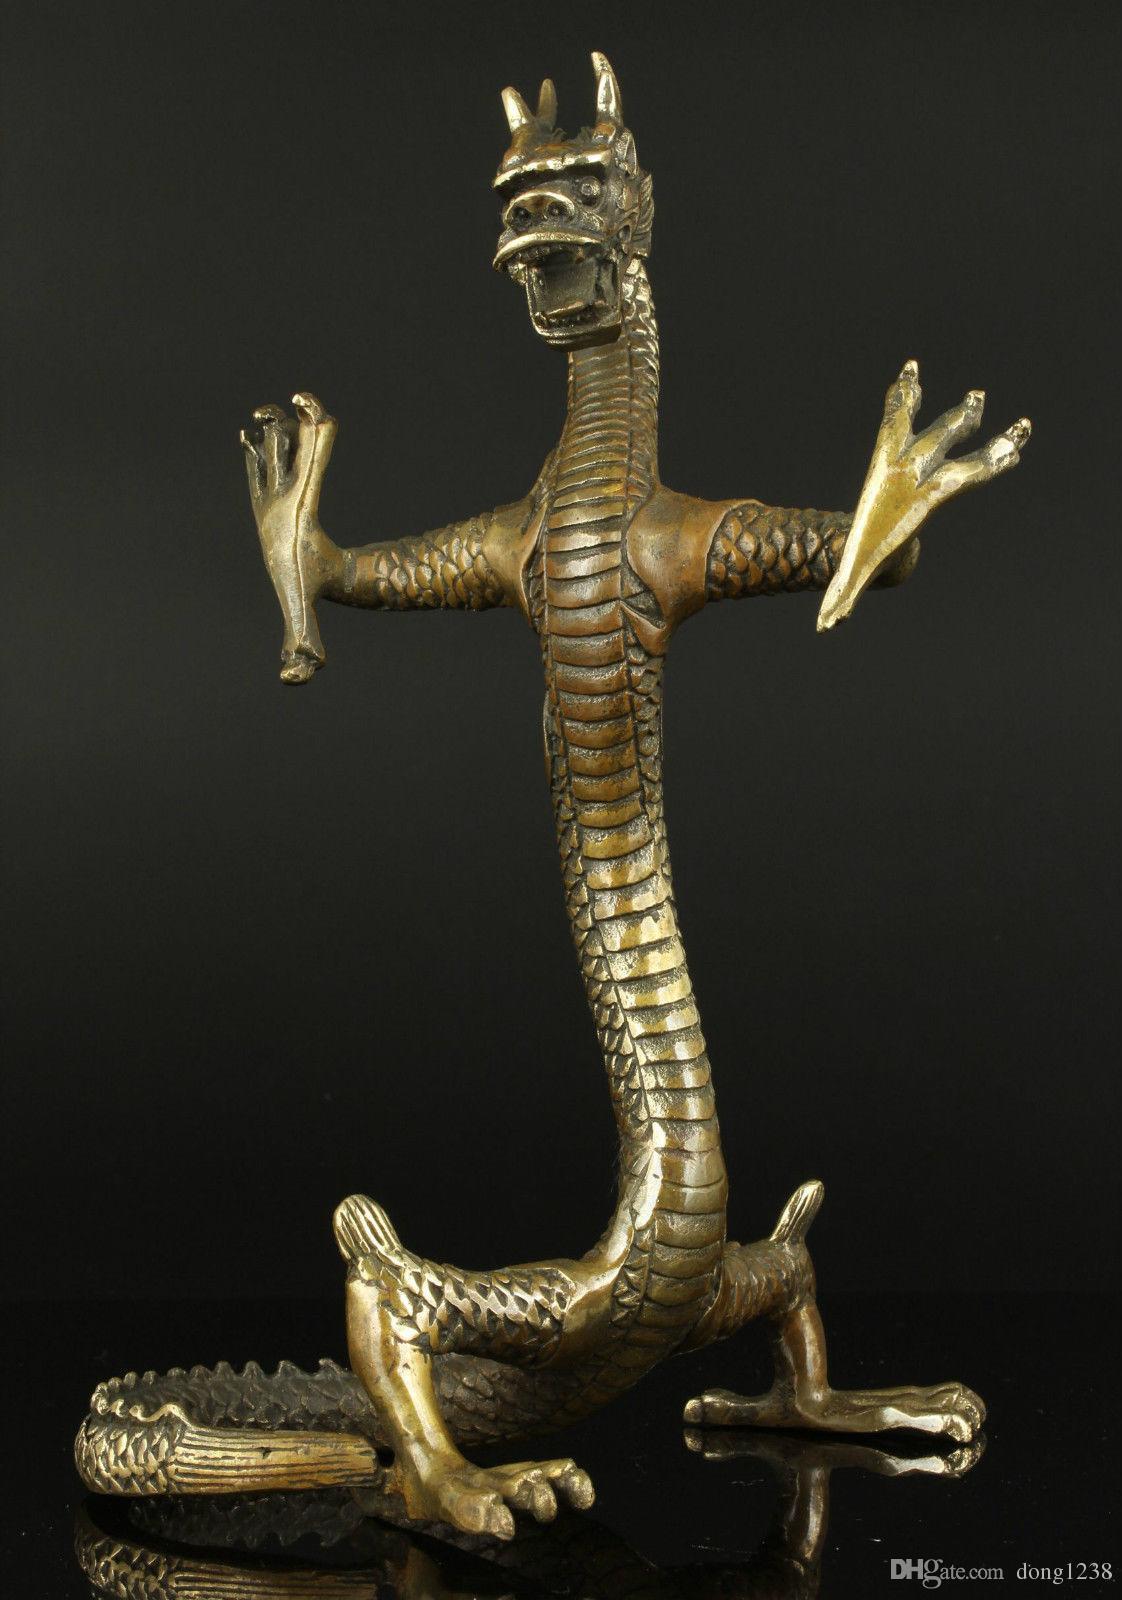 Koleksiyon Eski İşi Oyma Bronz Fierce Daimi Ejderha Heykeli